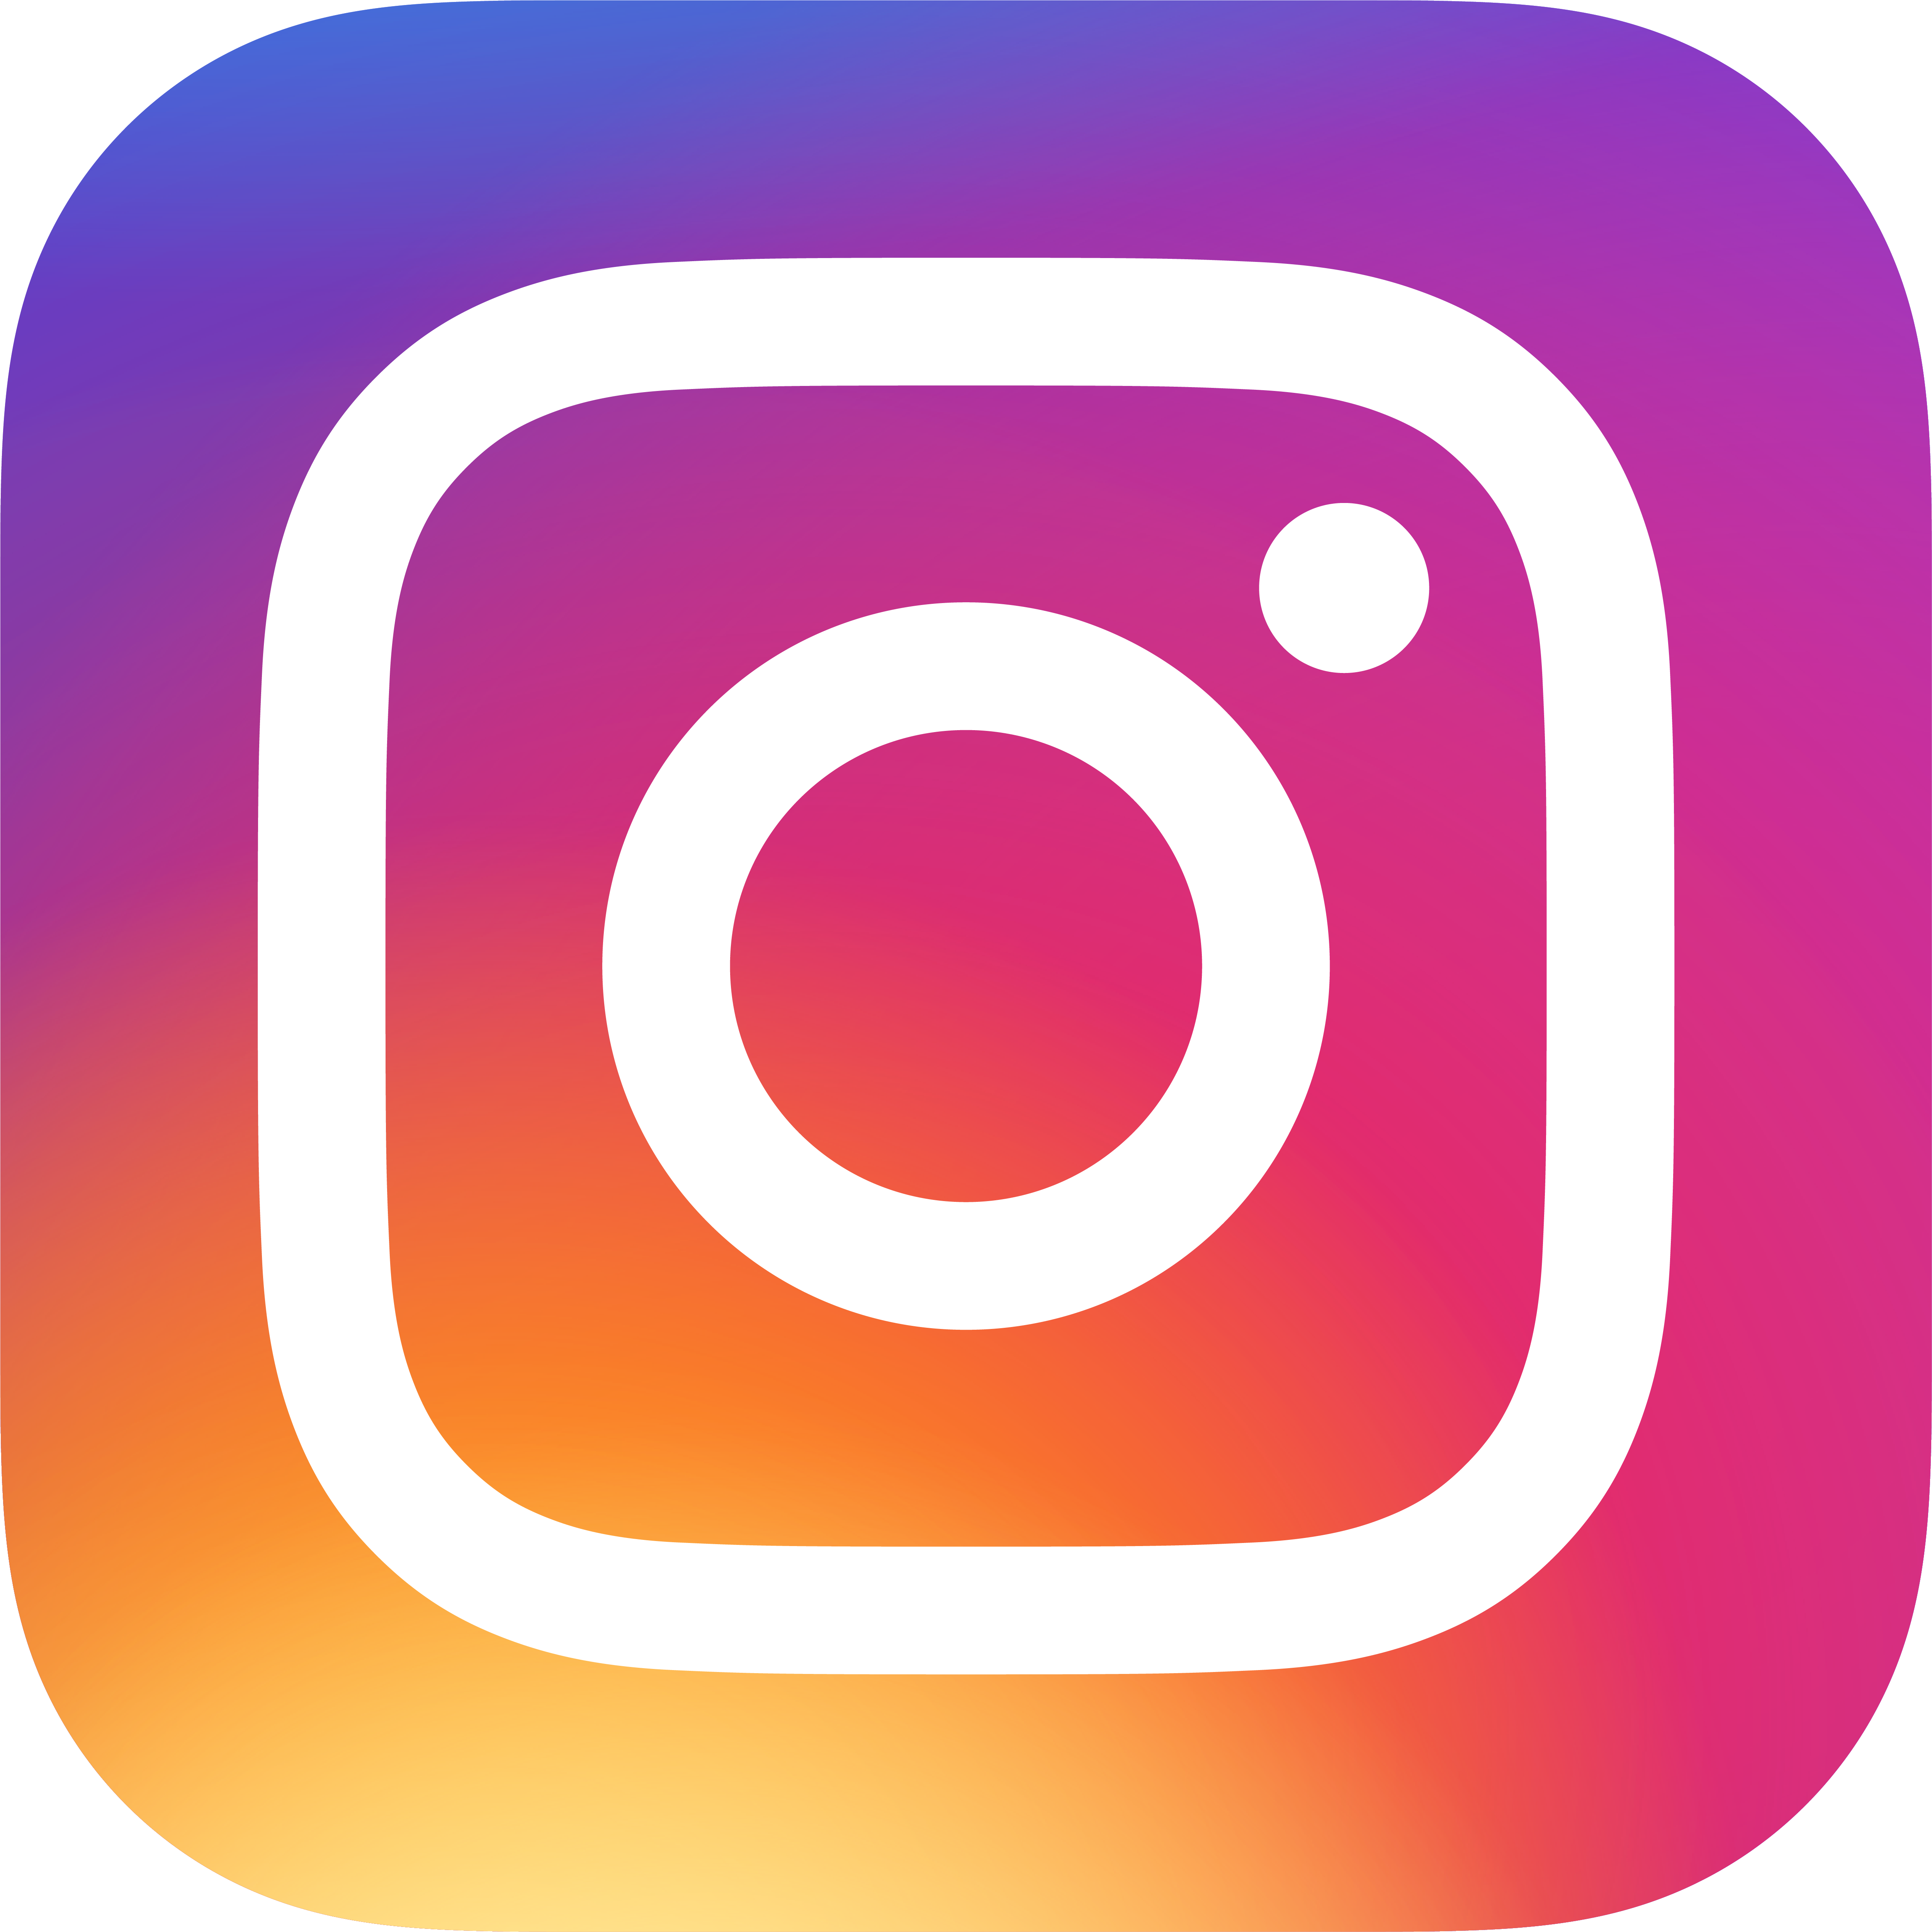 My Instagram account